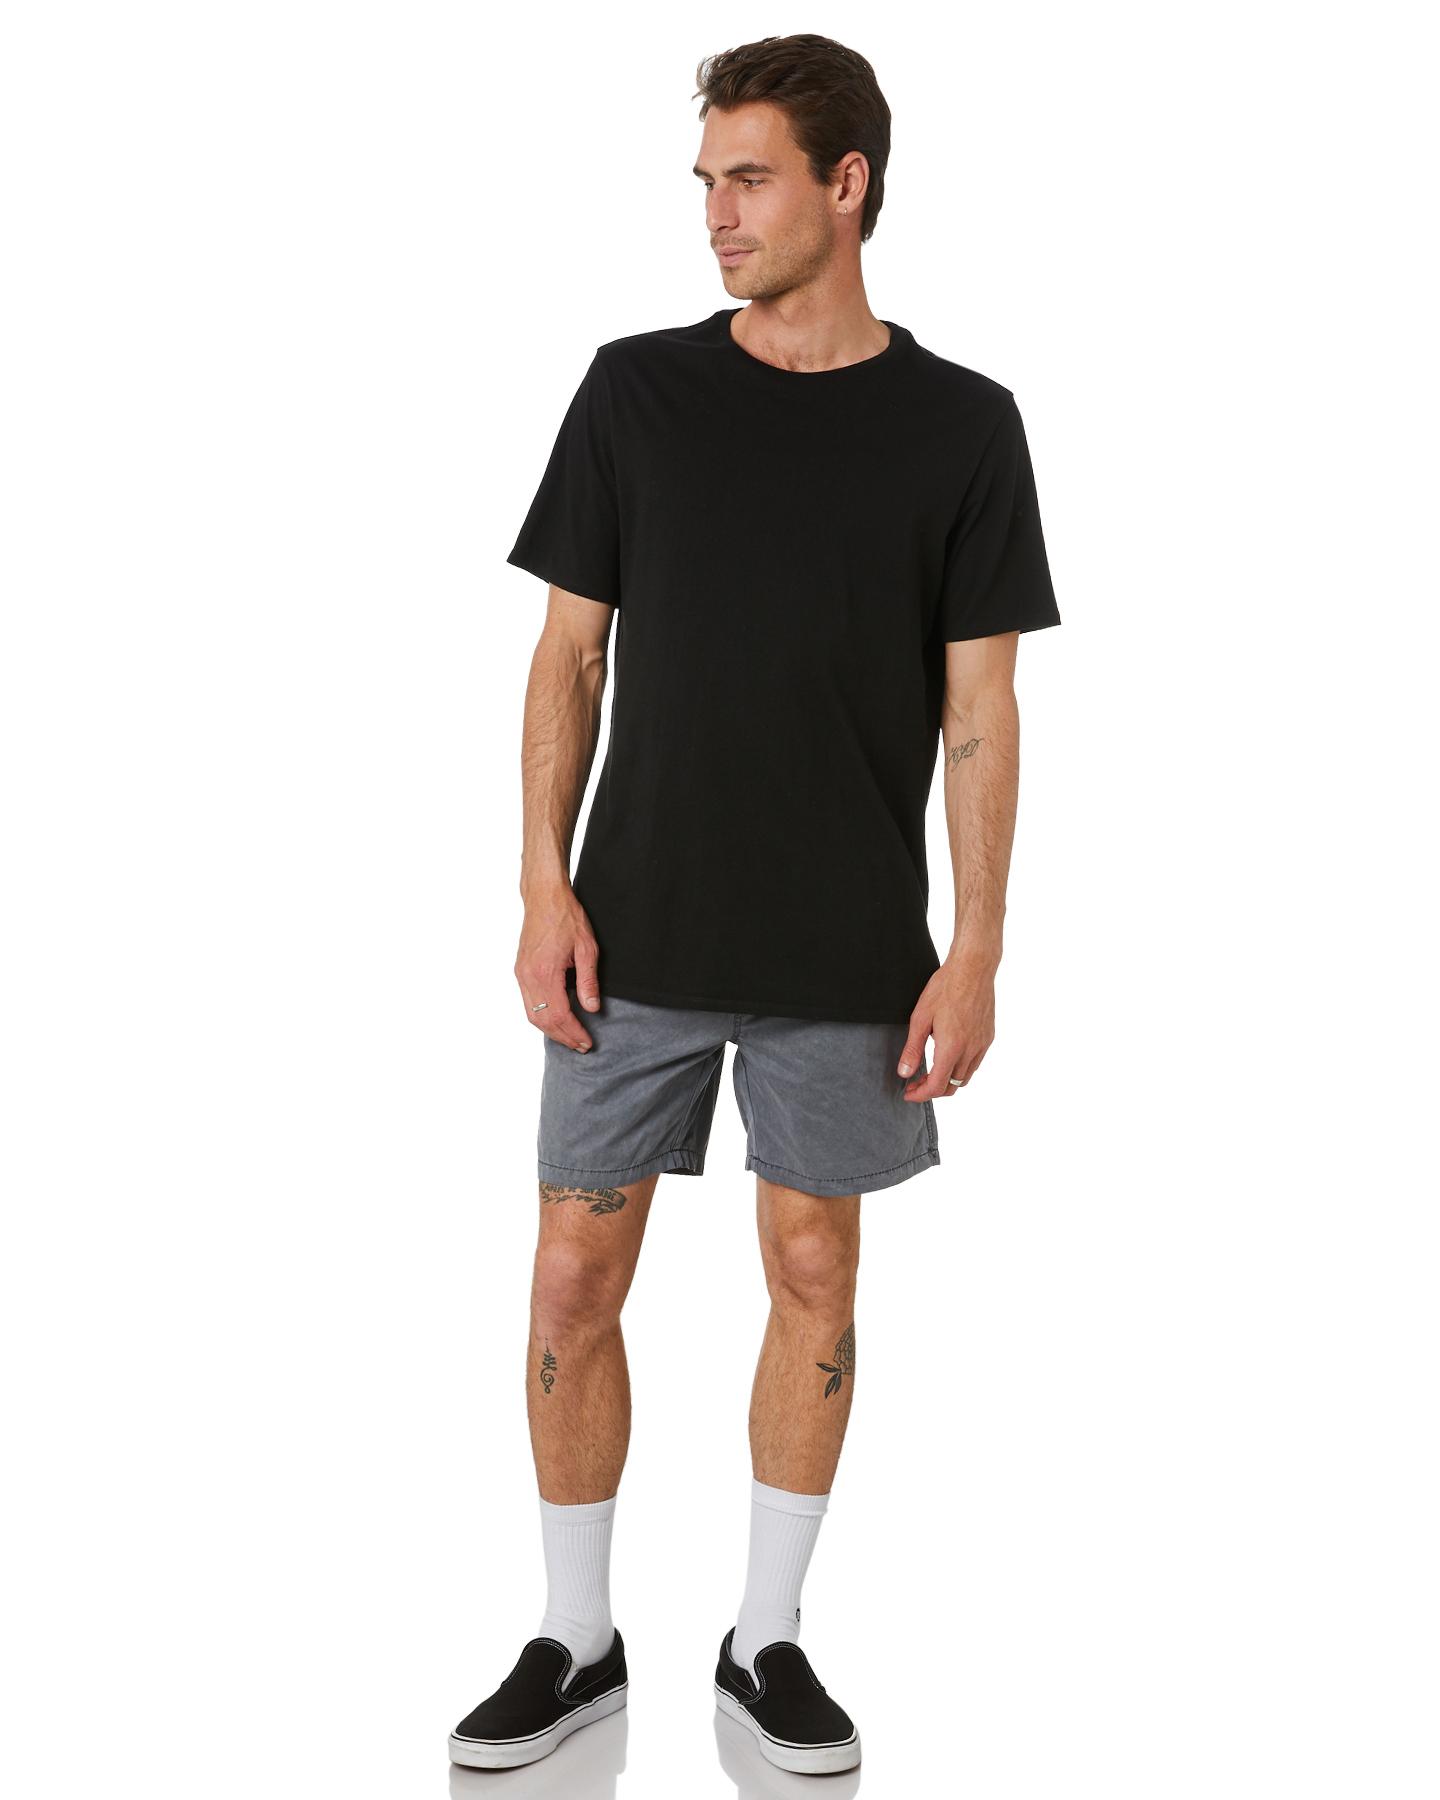 New-Swell-Men-039-s-Malibu-Mens-Beach-Short-Cotton-Polyester-Grey thumbnail 33